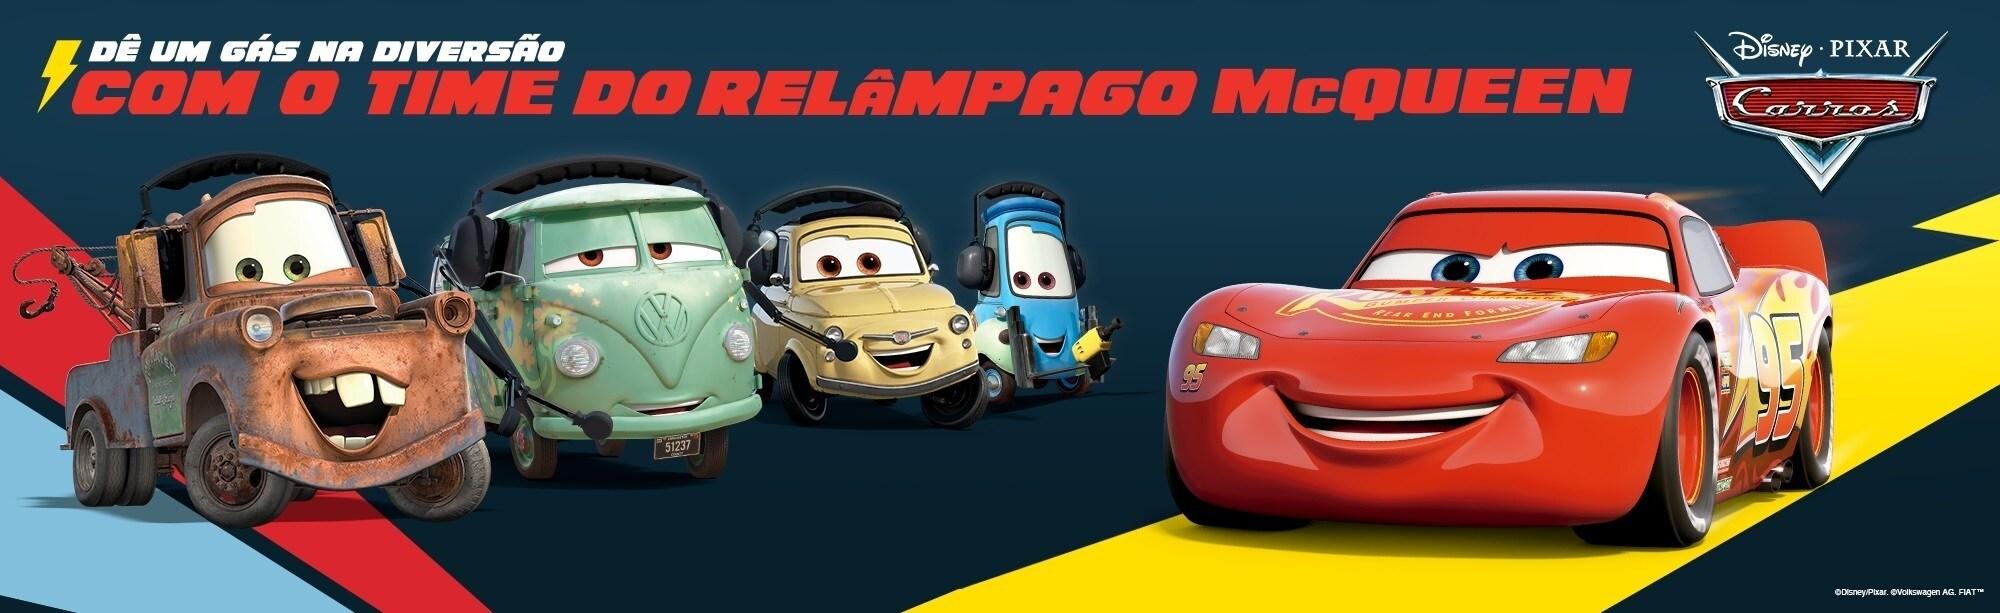 Mid_ShopDisney_Mar21_Cars Weeks (Home Pixar)